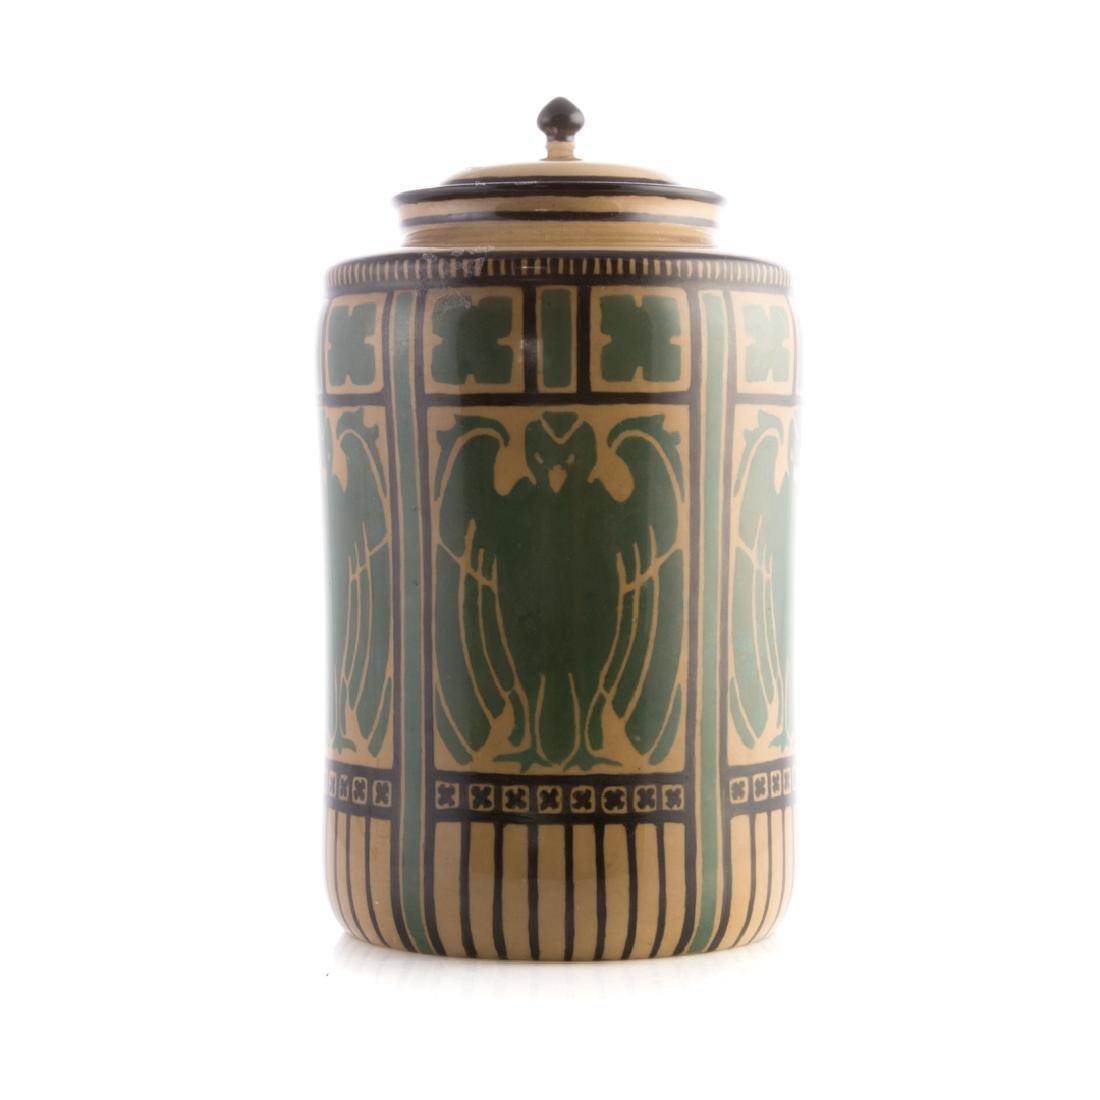 American Belleek (Lenox) ceramic jar